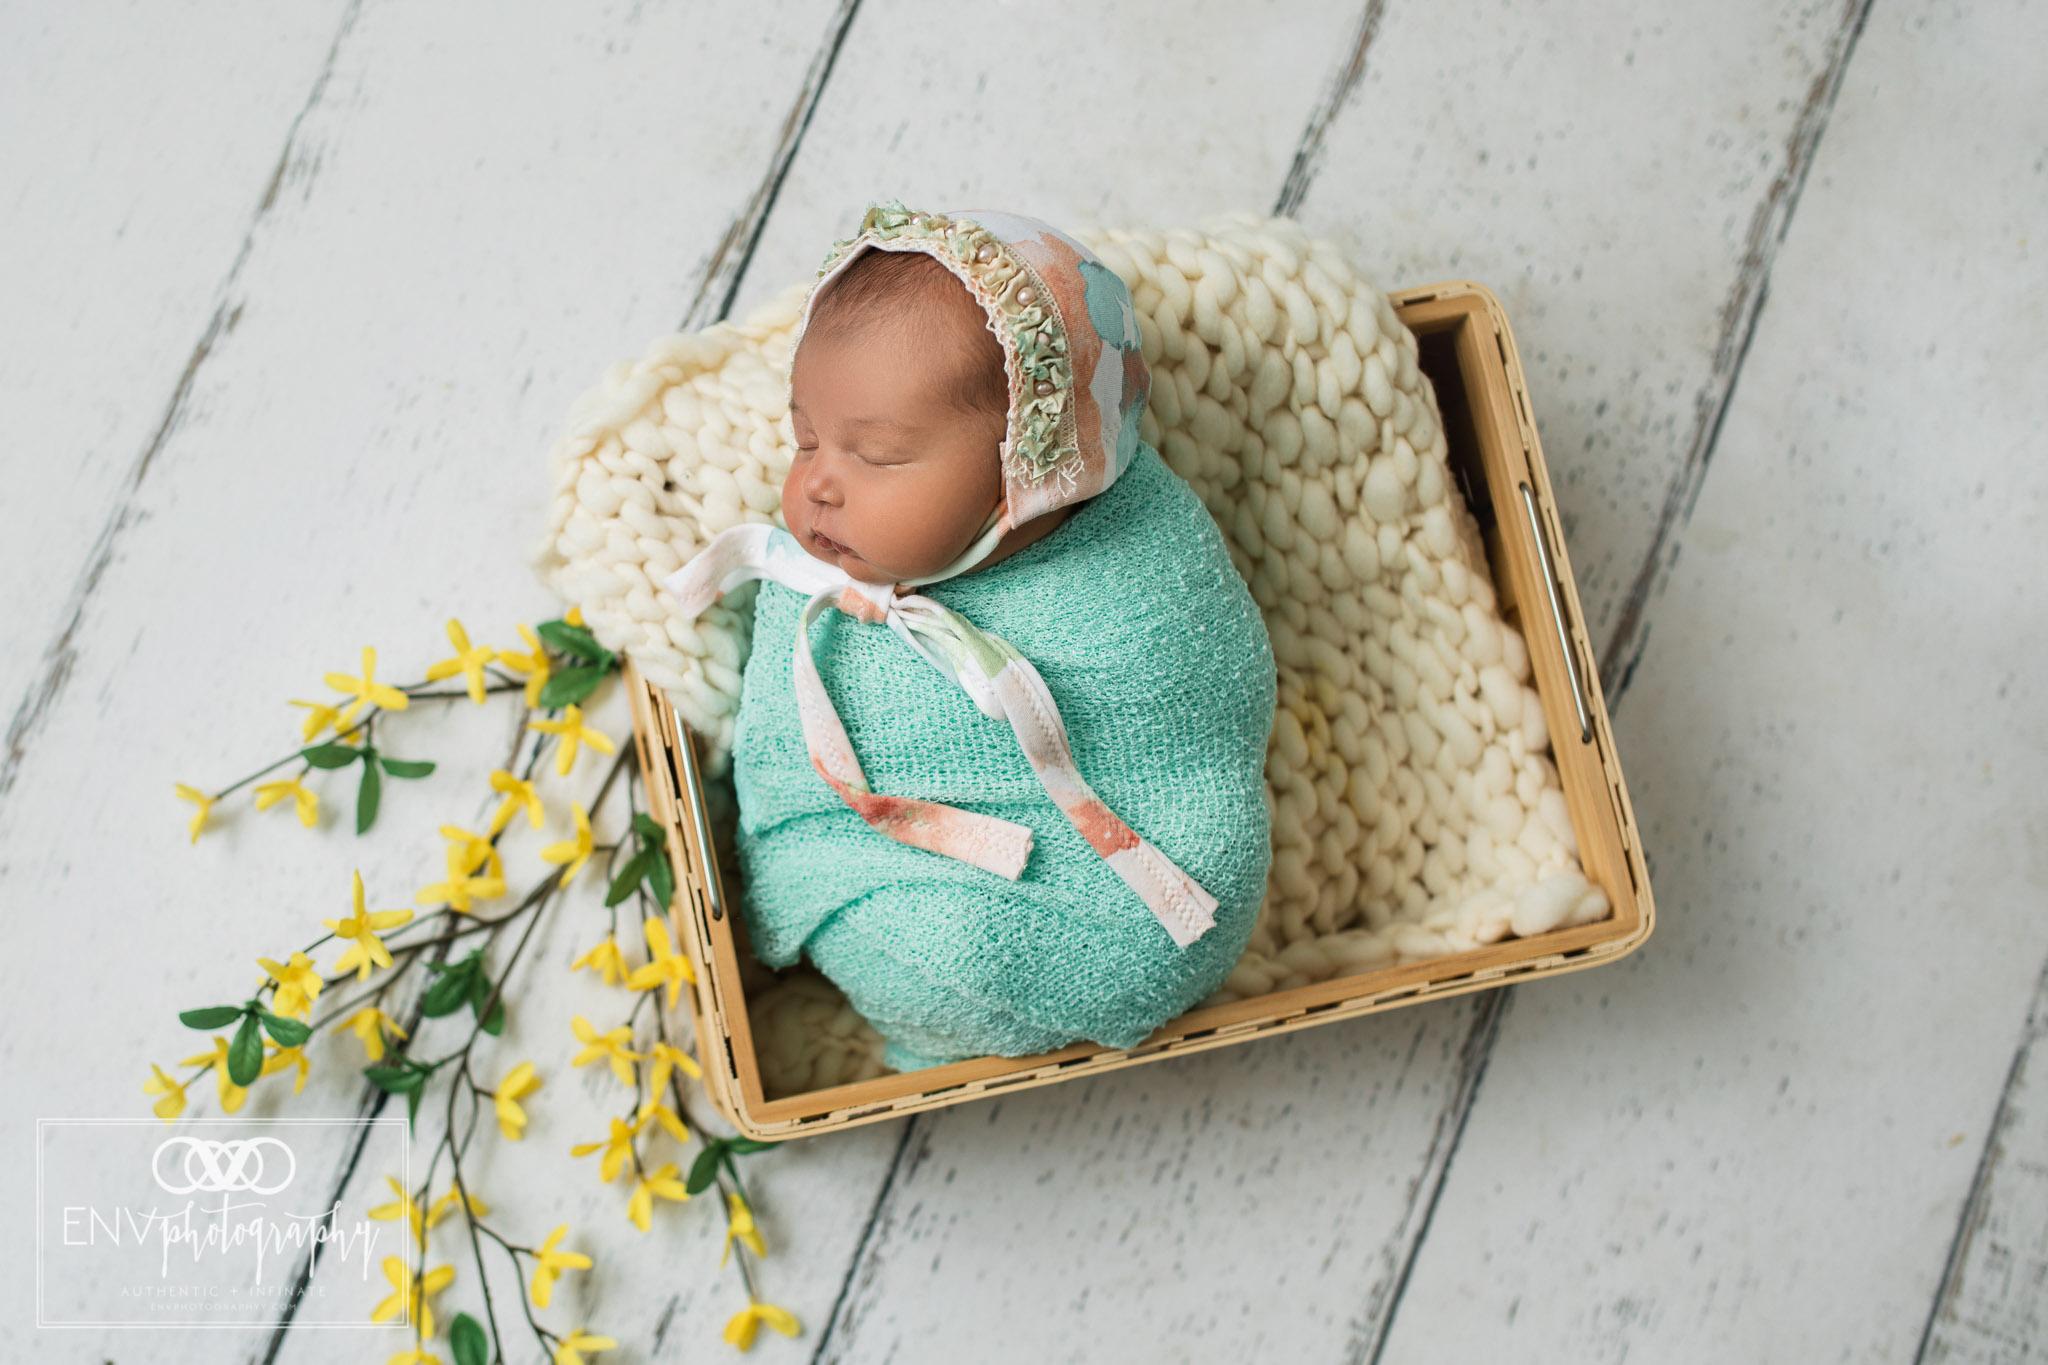 mount vernon ohio newborn photographer (11).jpg